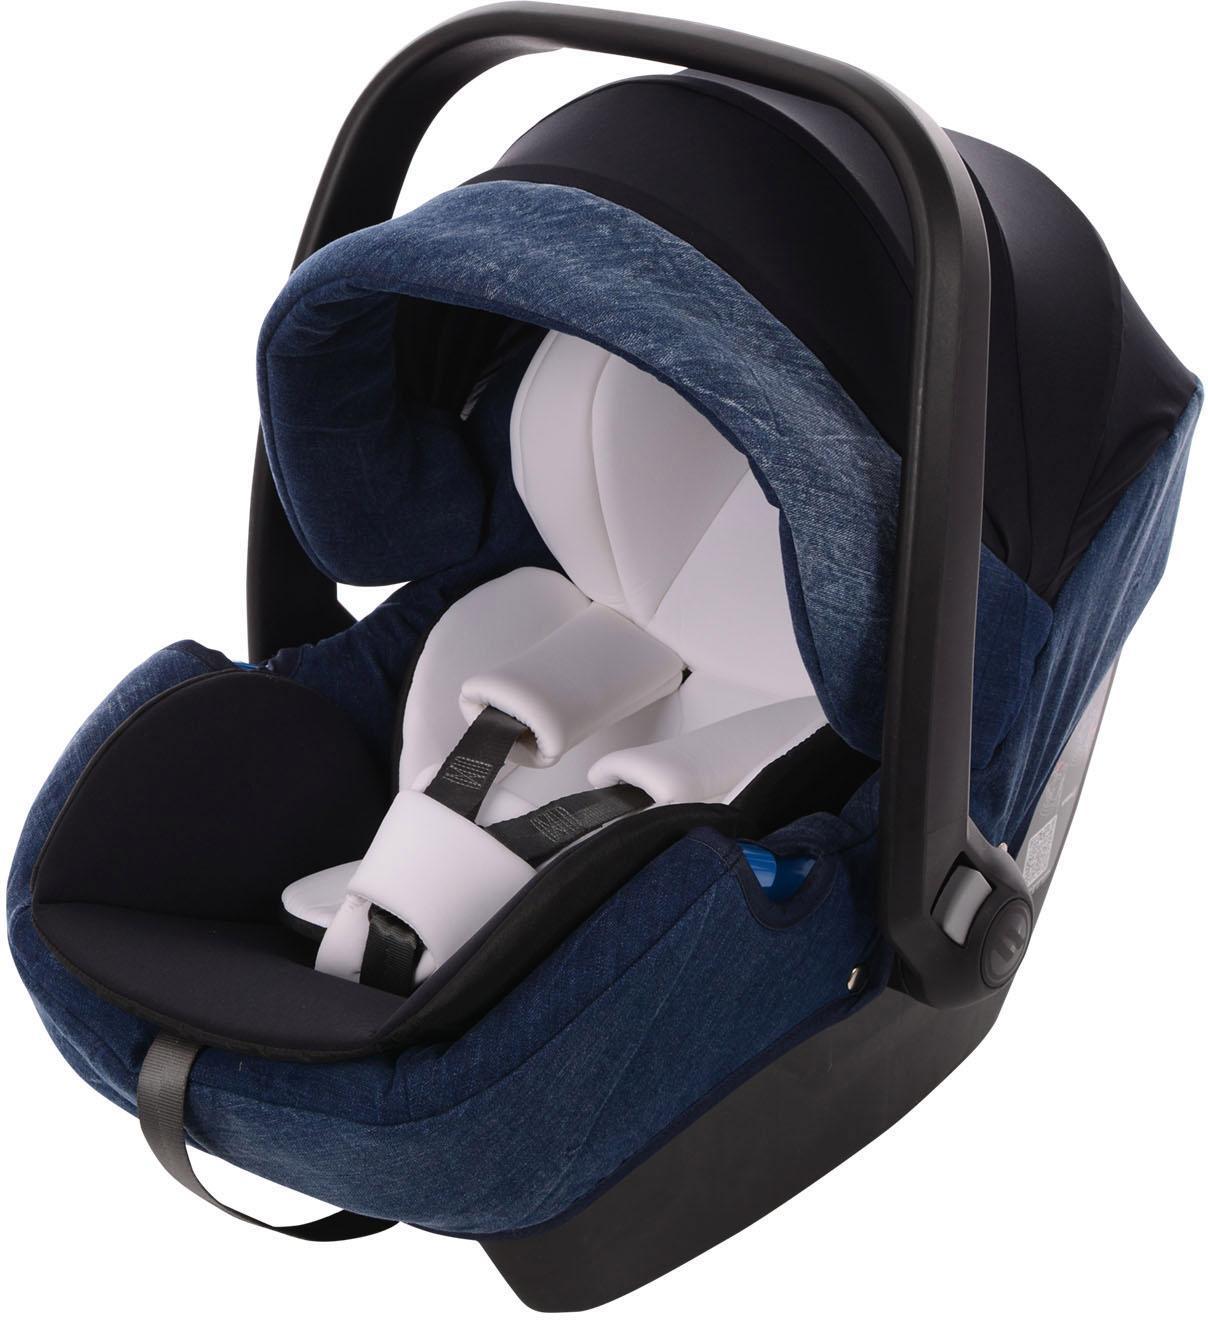 knorr-baby Babyschale, 0 - 13 kg, »K-One, blue-jeans« | Bekleidung > Jeans > Sonstige Jeans | Blau | Ab | KNORR-BABY